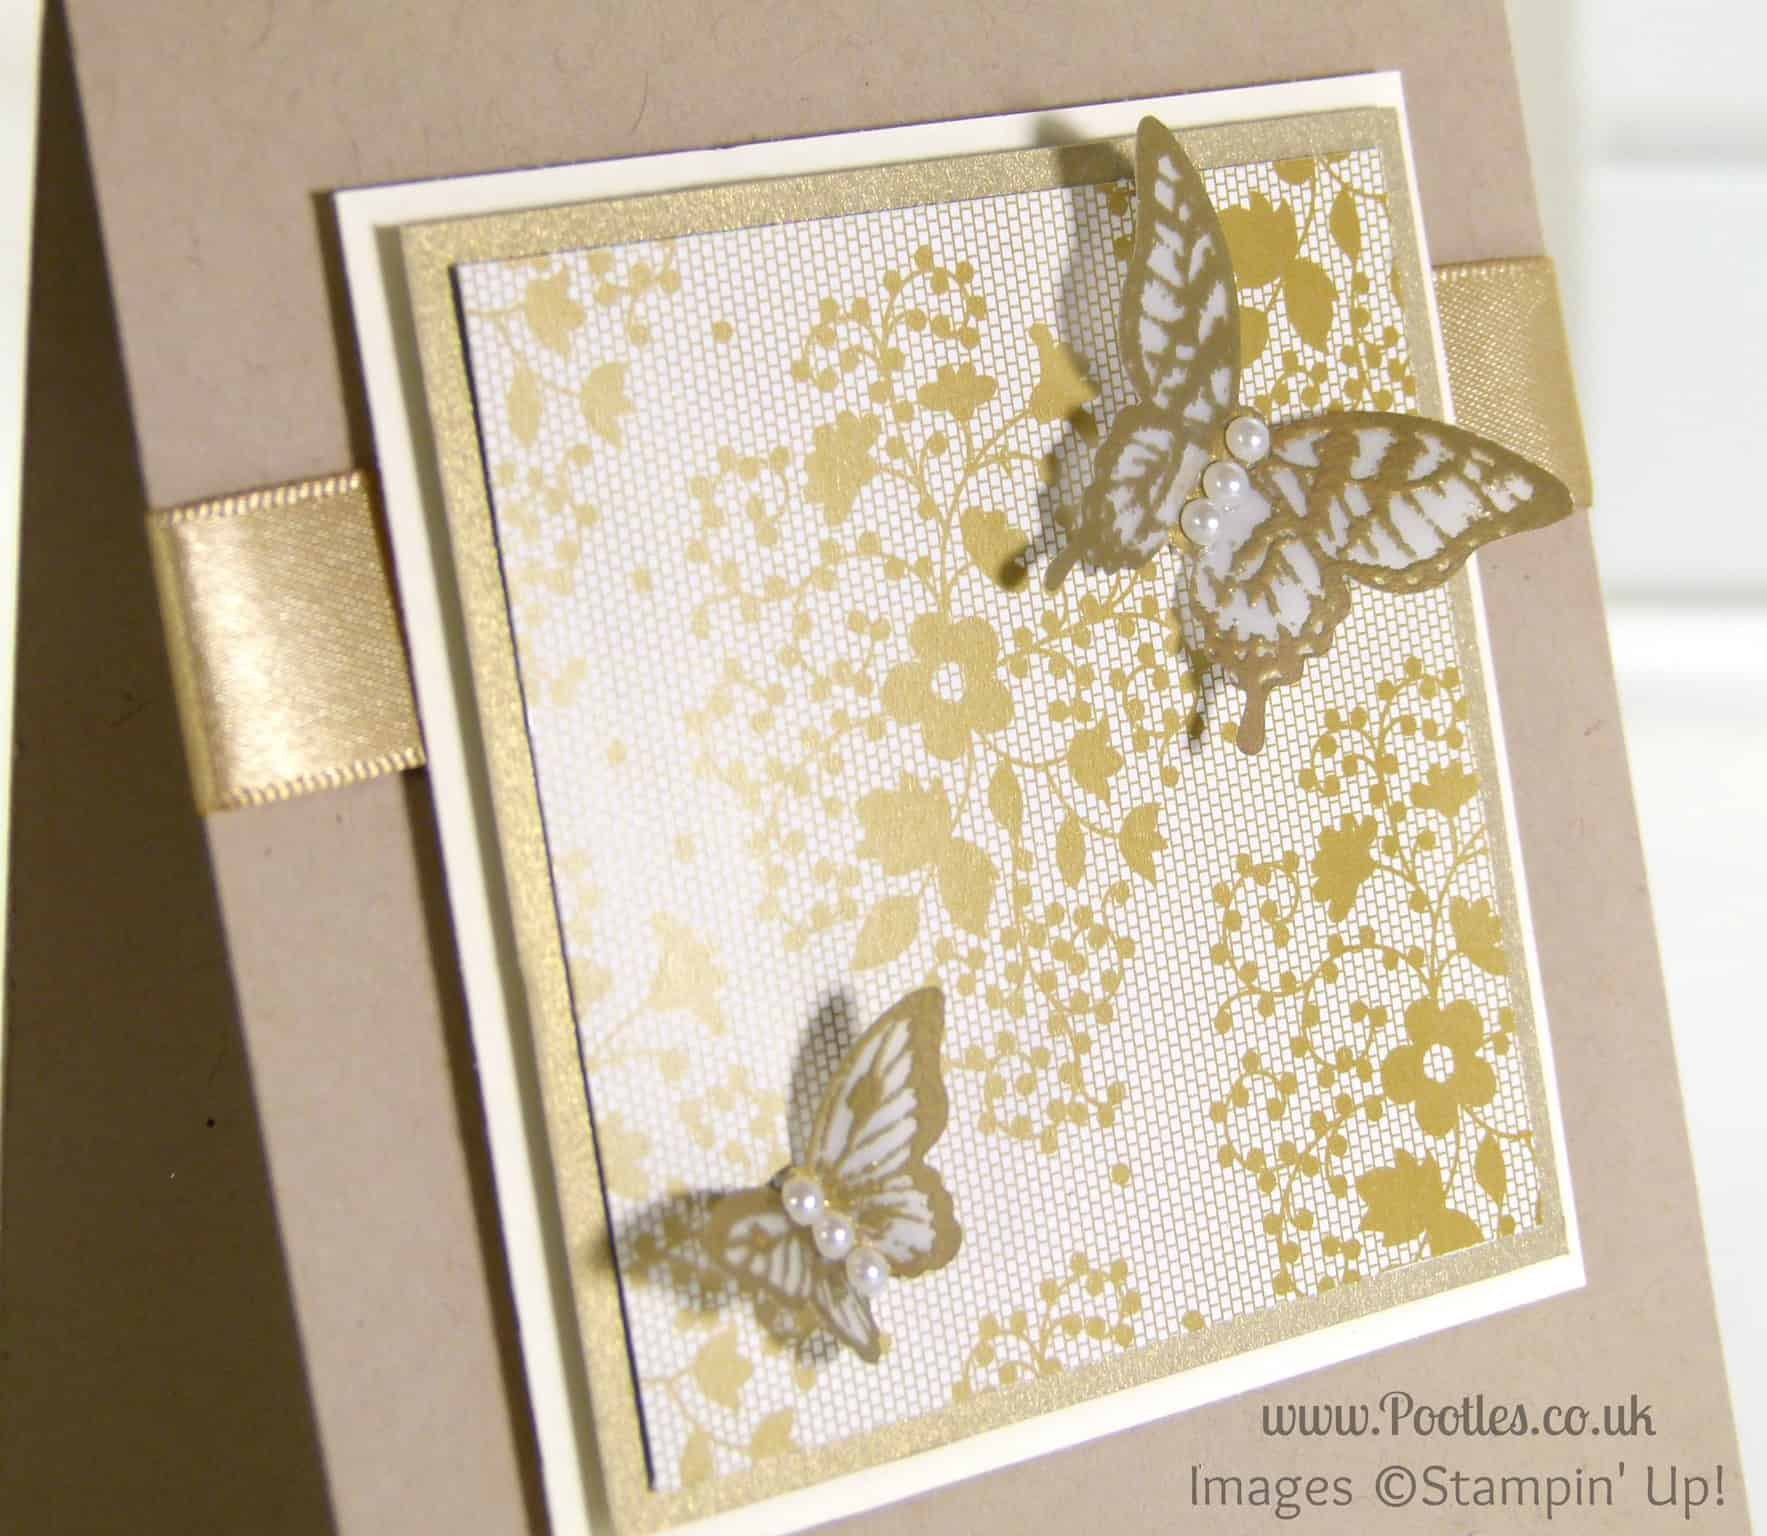 South Hill Designs & Stampin' Up! Sunday Golden Butterflies Showcase